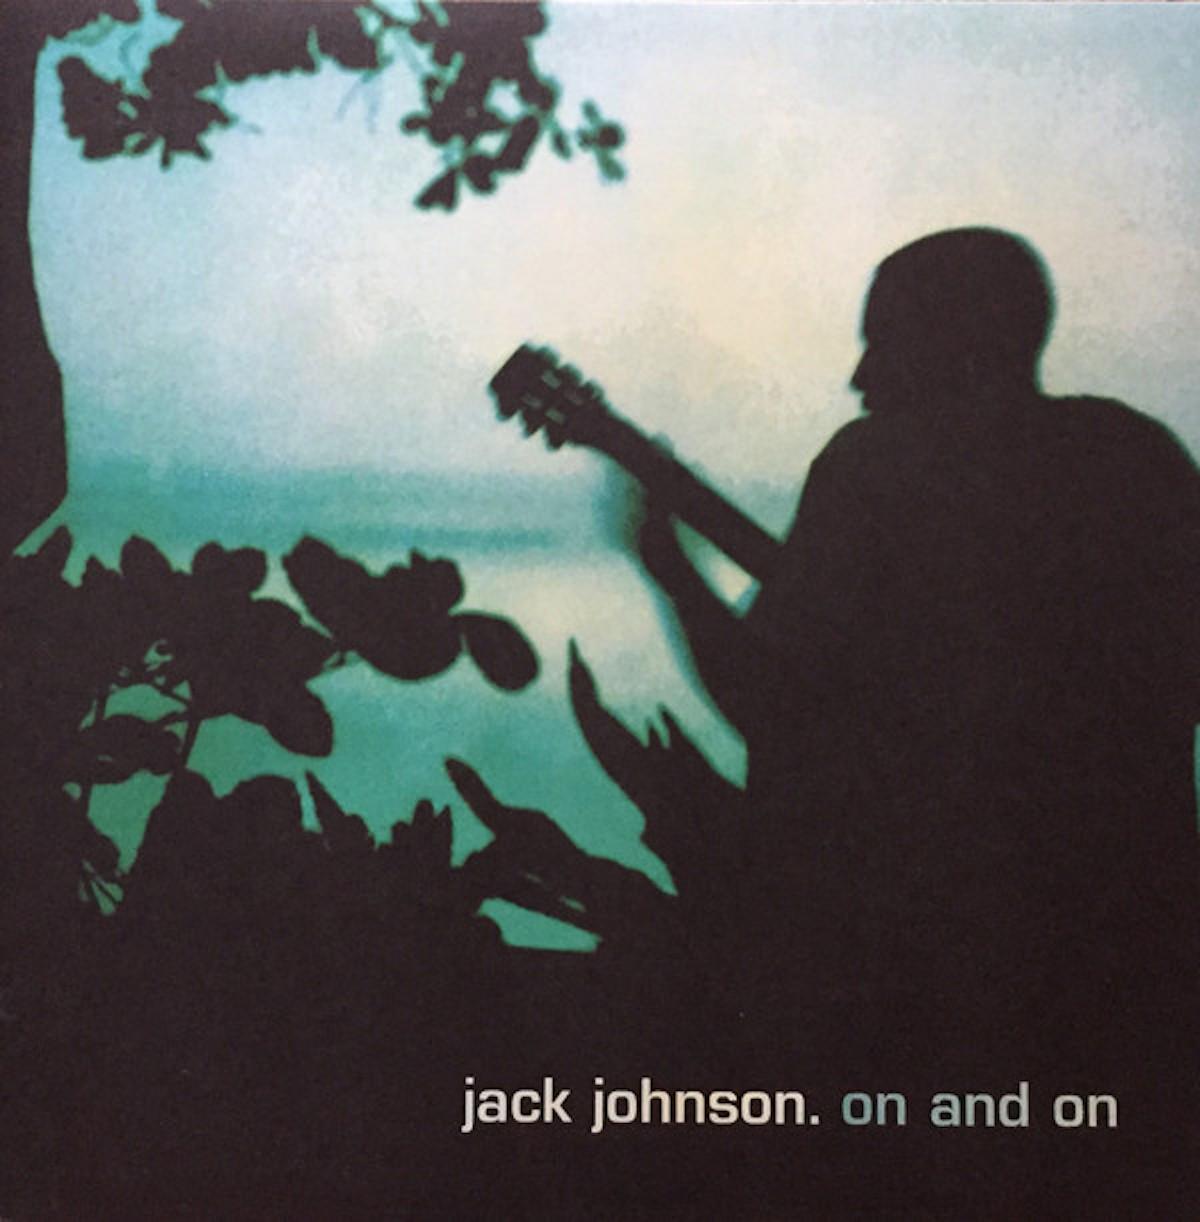 Jack Johnson, On and On